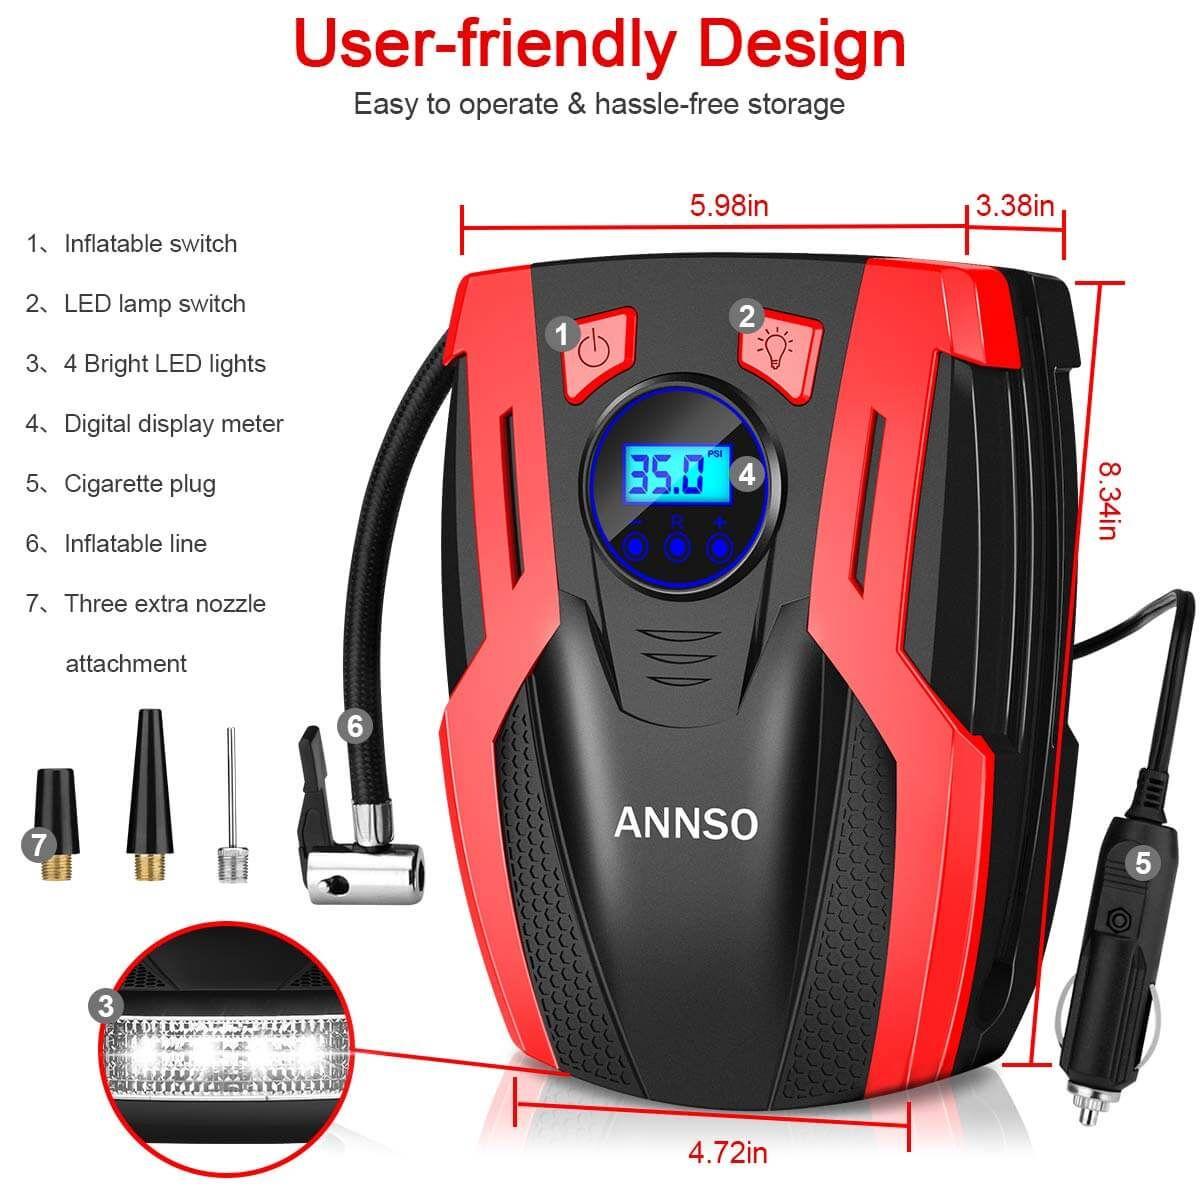 Annso Air Compressor Tire Inflator in 2020 Portable air